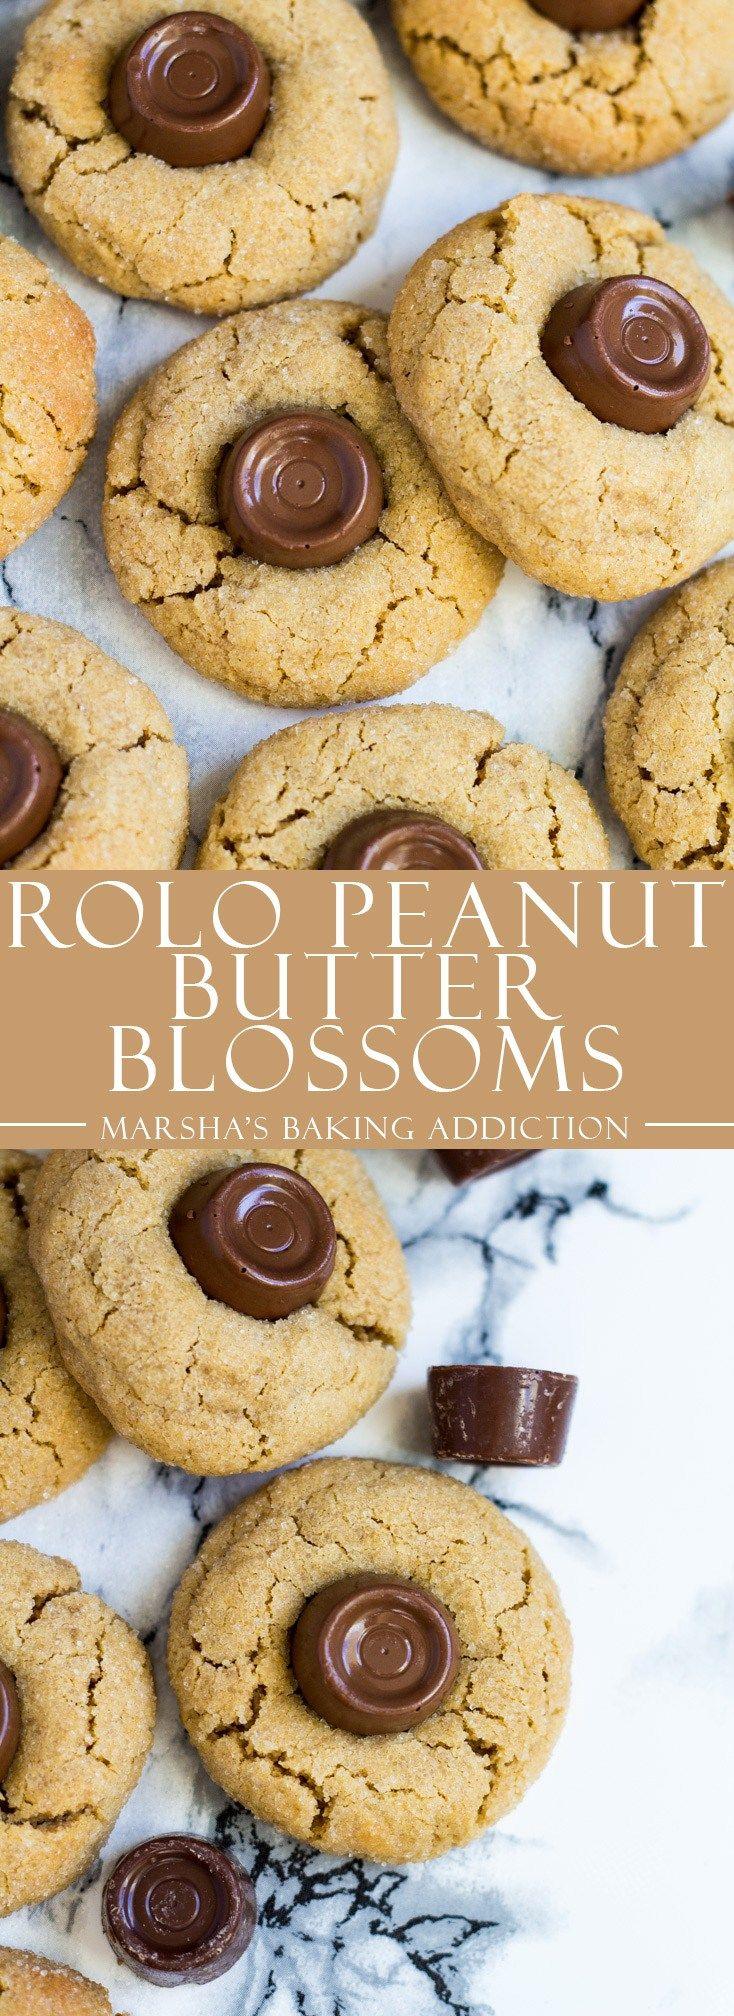 Rolo Peanut Butter Blossoms | marshasbakingaddiction.com @marshasbakeblog